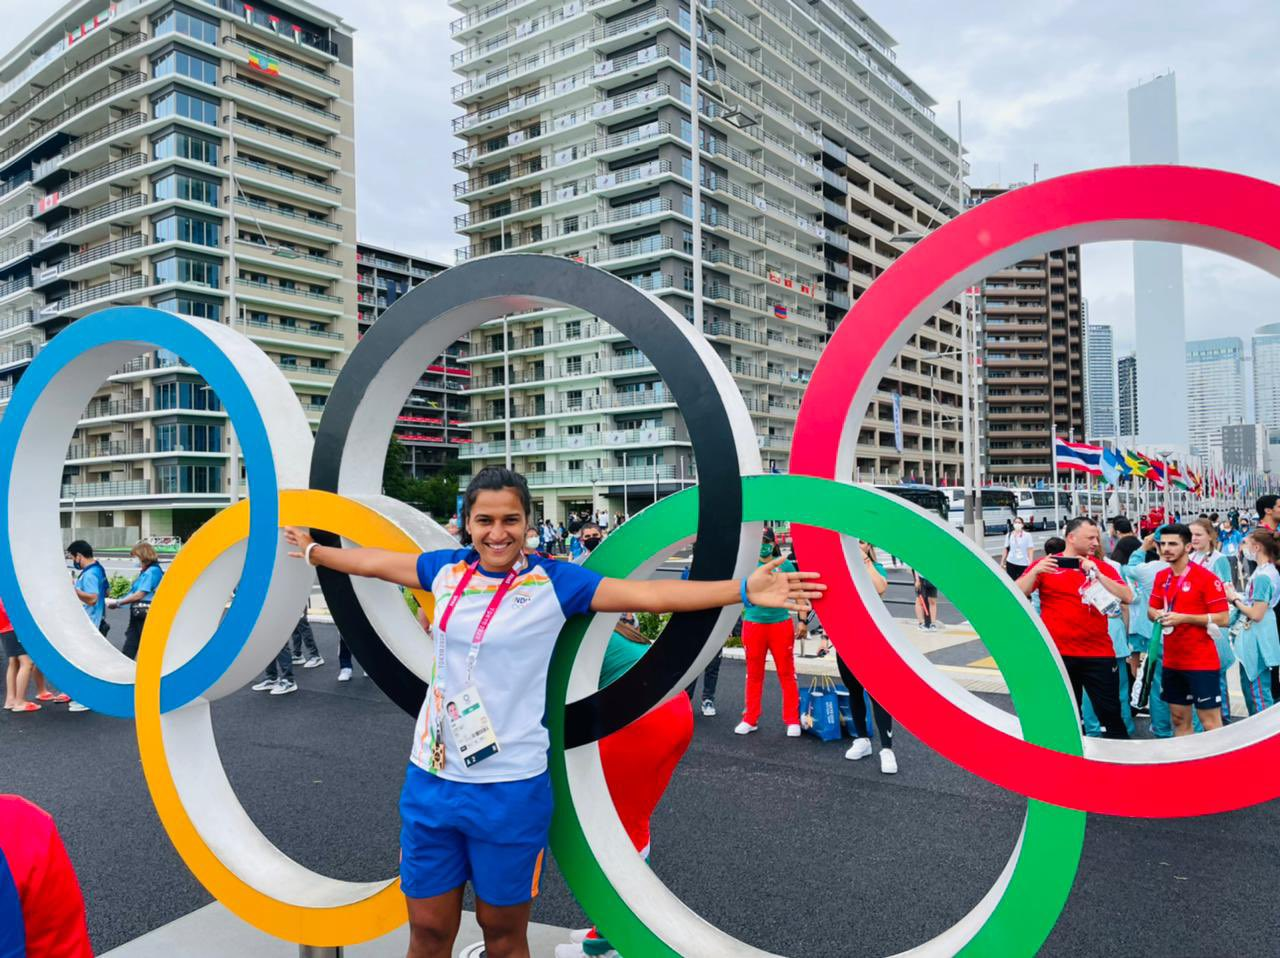 भारतीय महिला हॉकी टीम की कप्तान रानी रामपाल